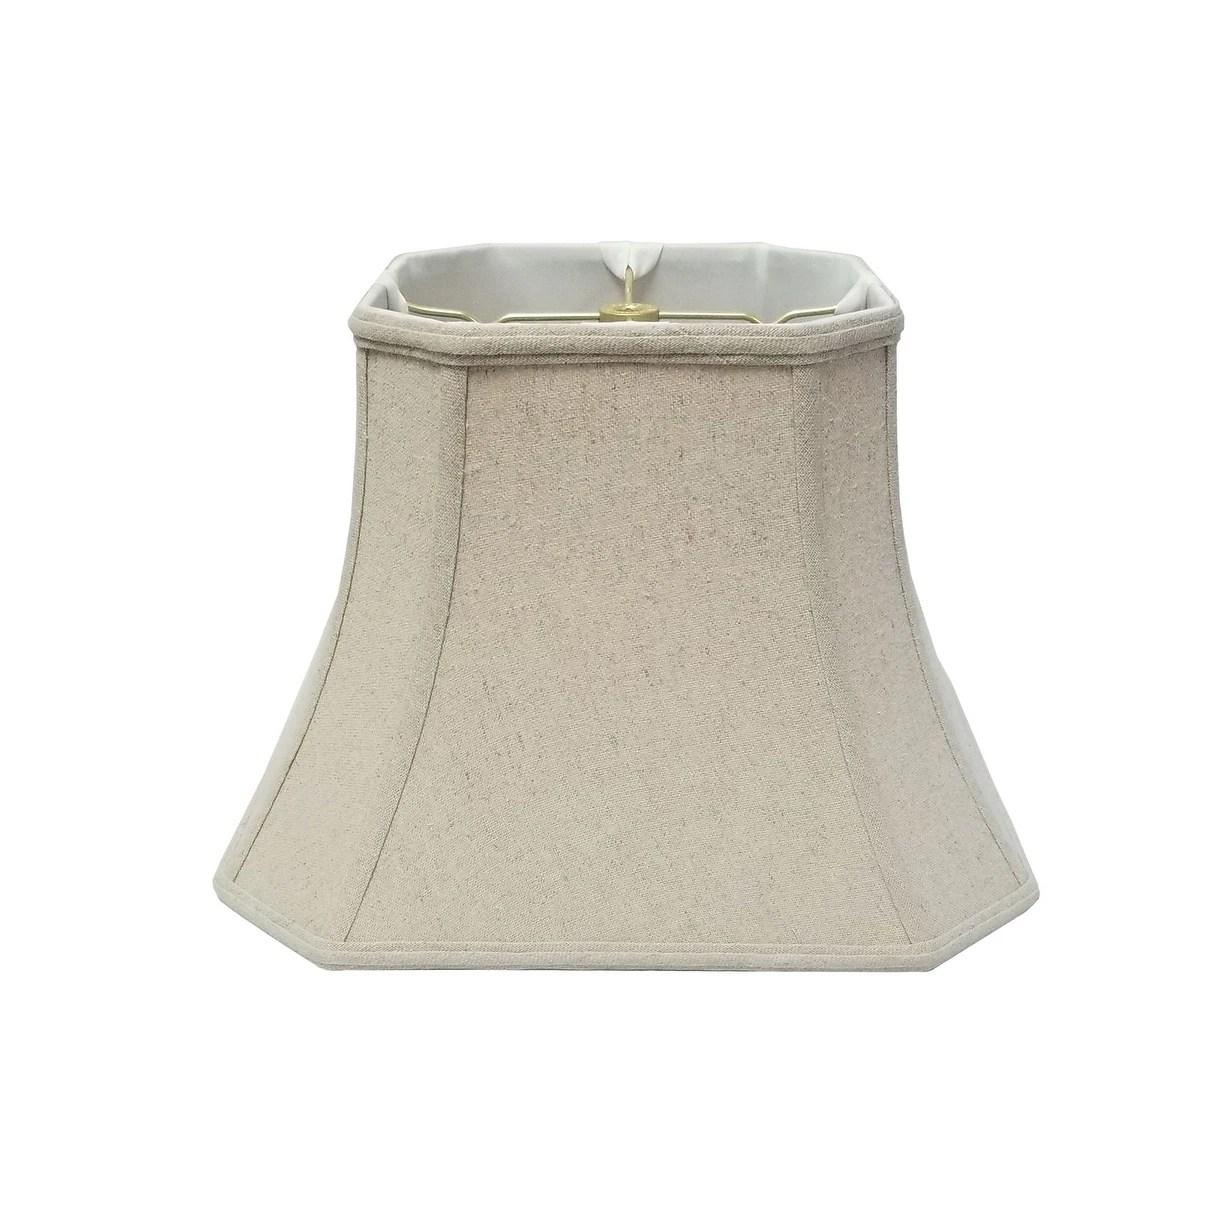 Shop Royal Designs Square Cut Corner Bell Linen Cream Lamp Shade 10 X 18 X 14 5 On Sale Overstock 14804883